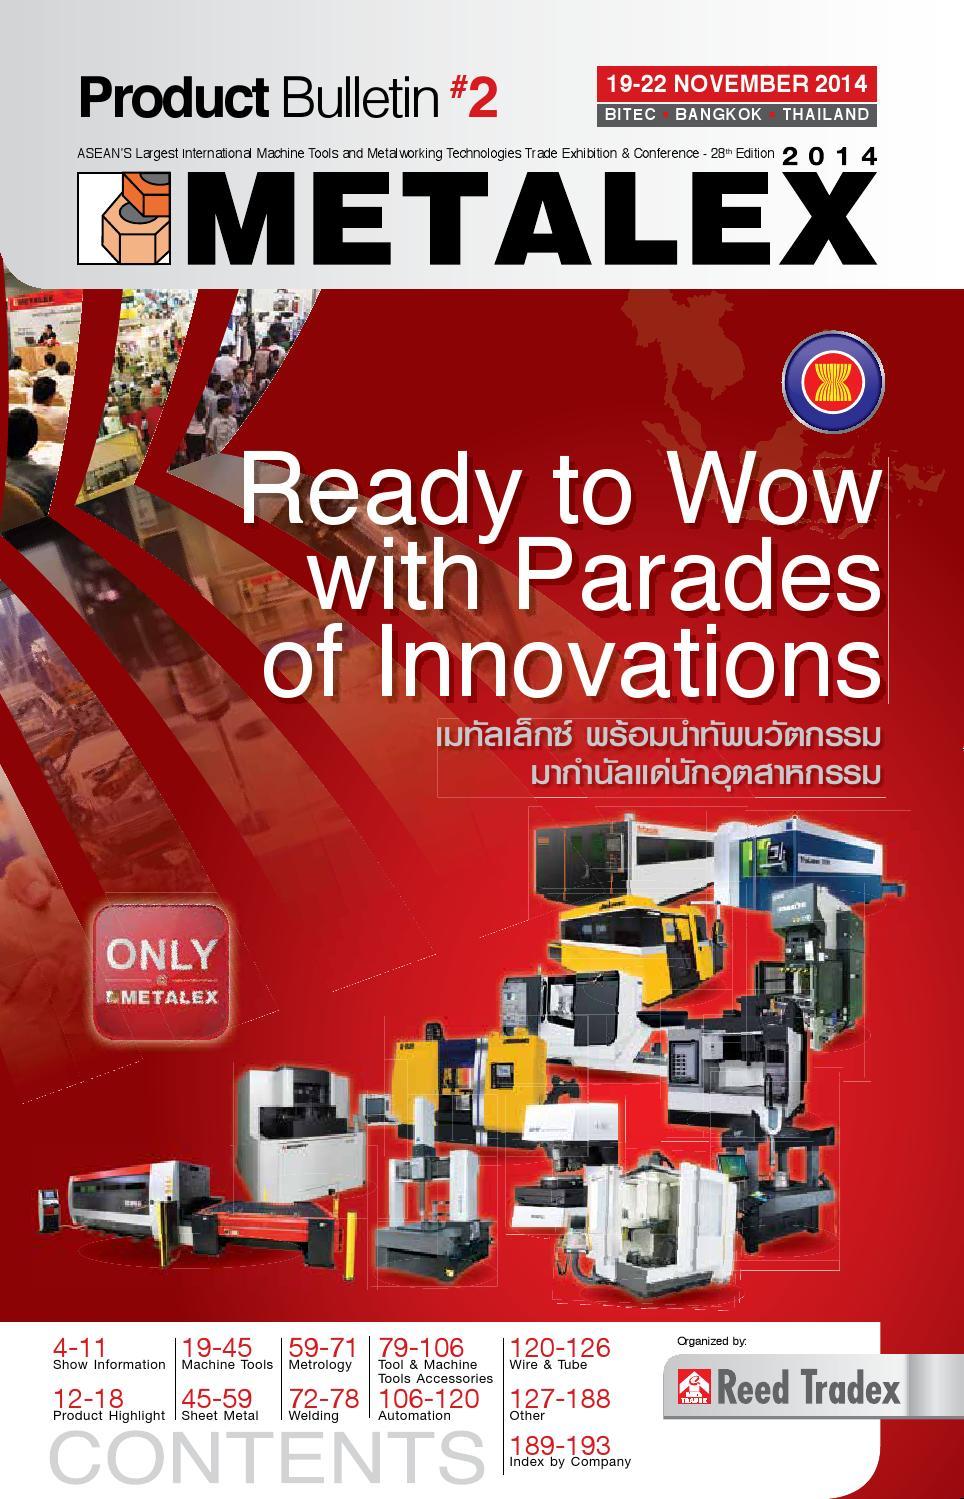 Issuu Mtx 2014 Product Bulletin 2 By Reed Tradex Co Ltd